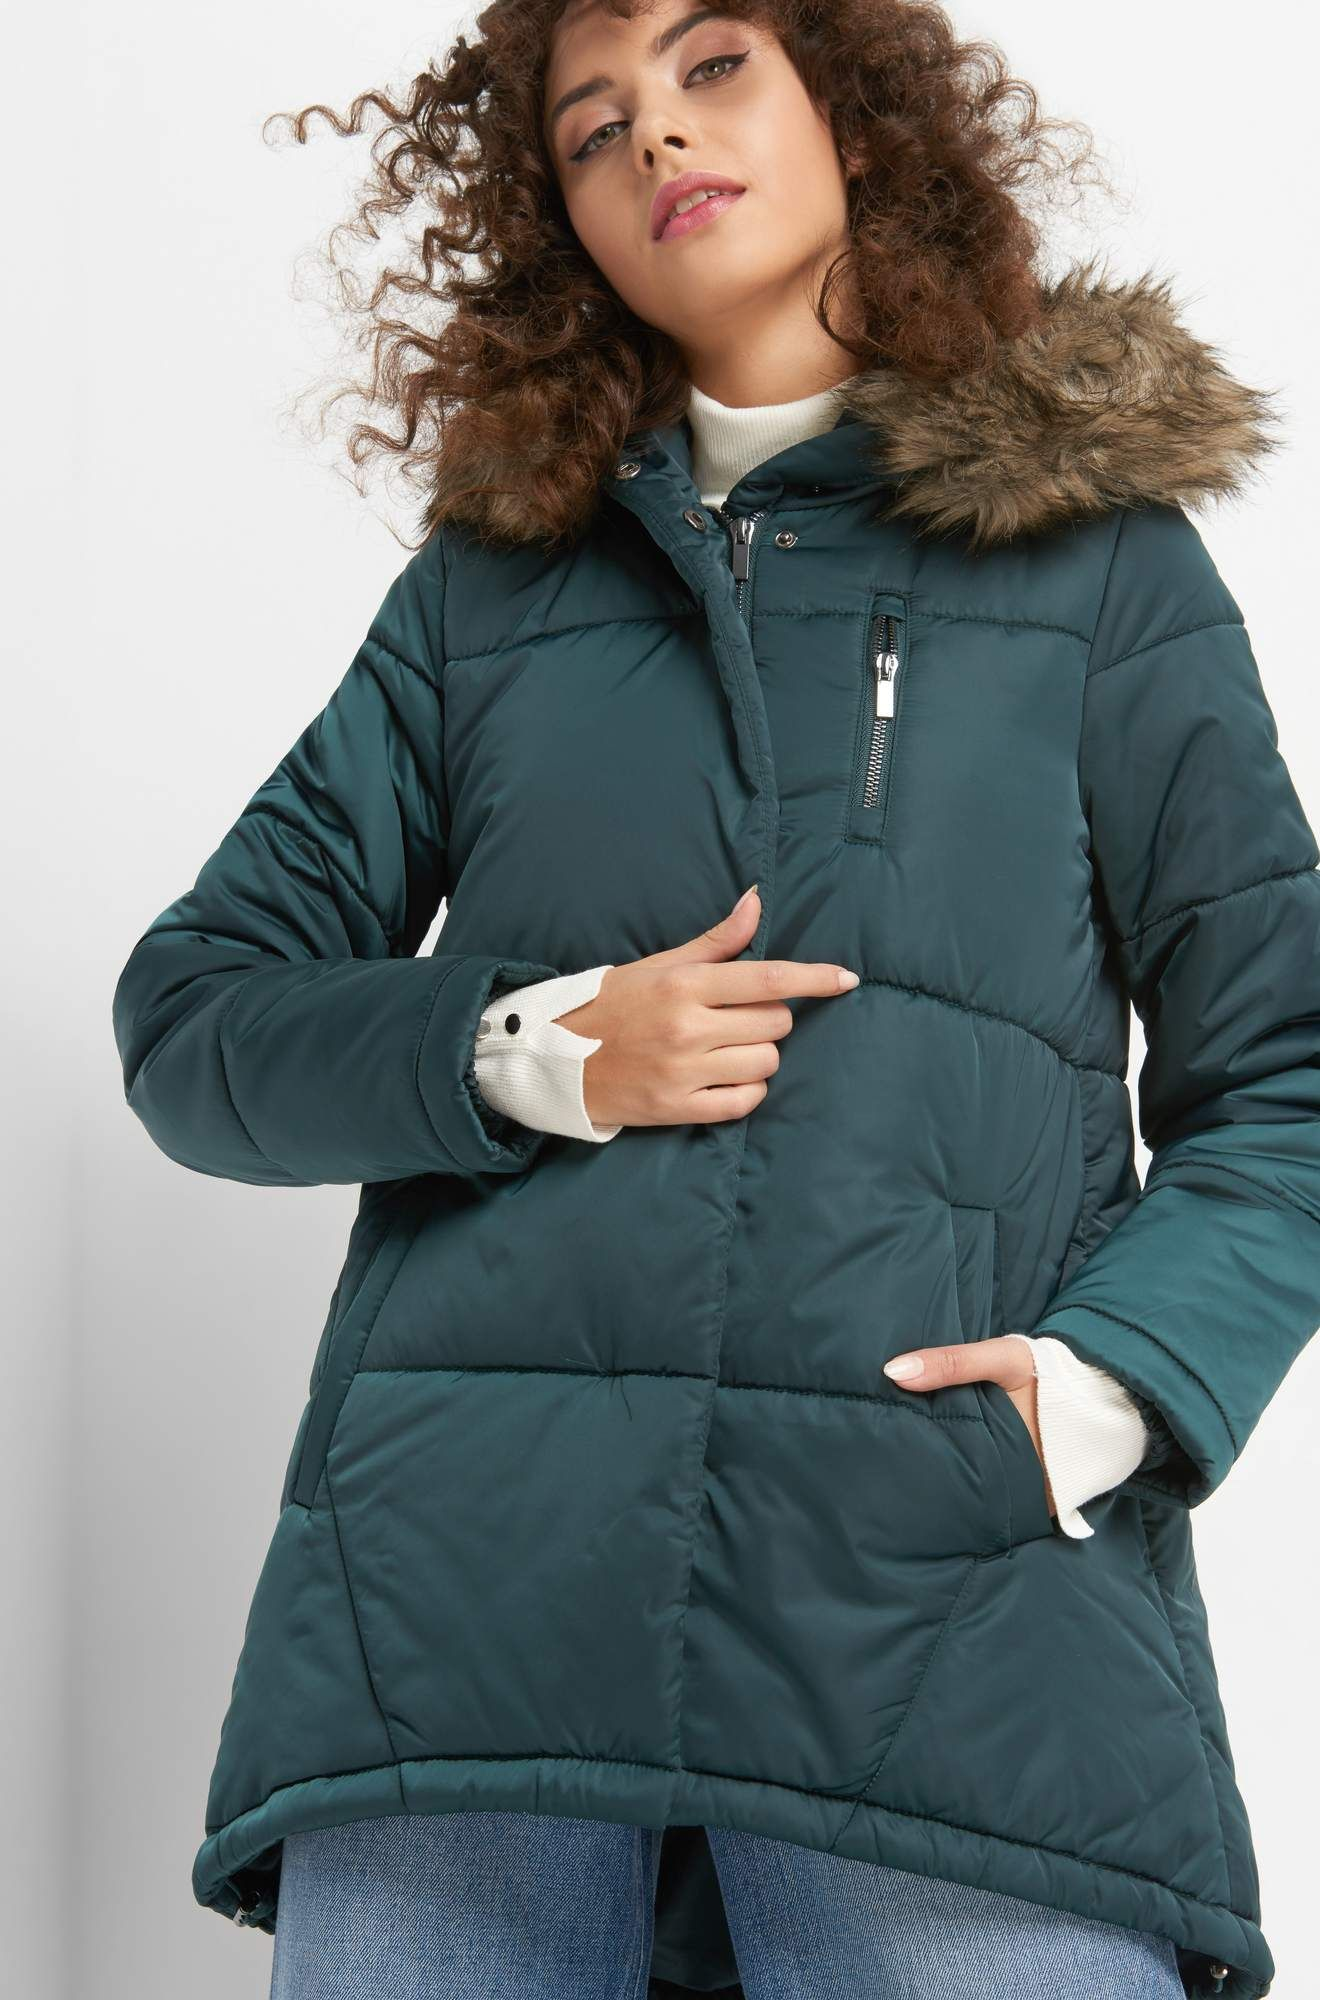 c6b1ea5ebb556c Winterjacke mit Kapuze von ORSAY | Jacken & Mäntel Damen | Winter ...